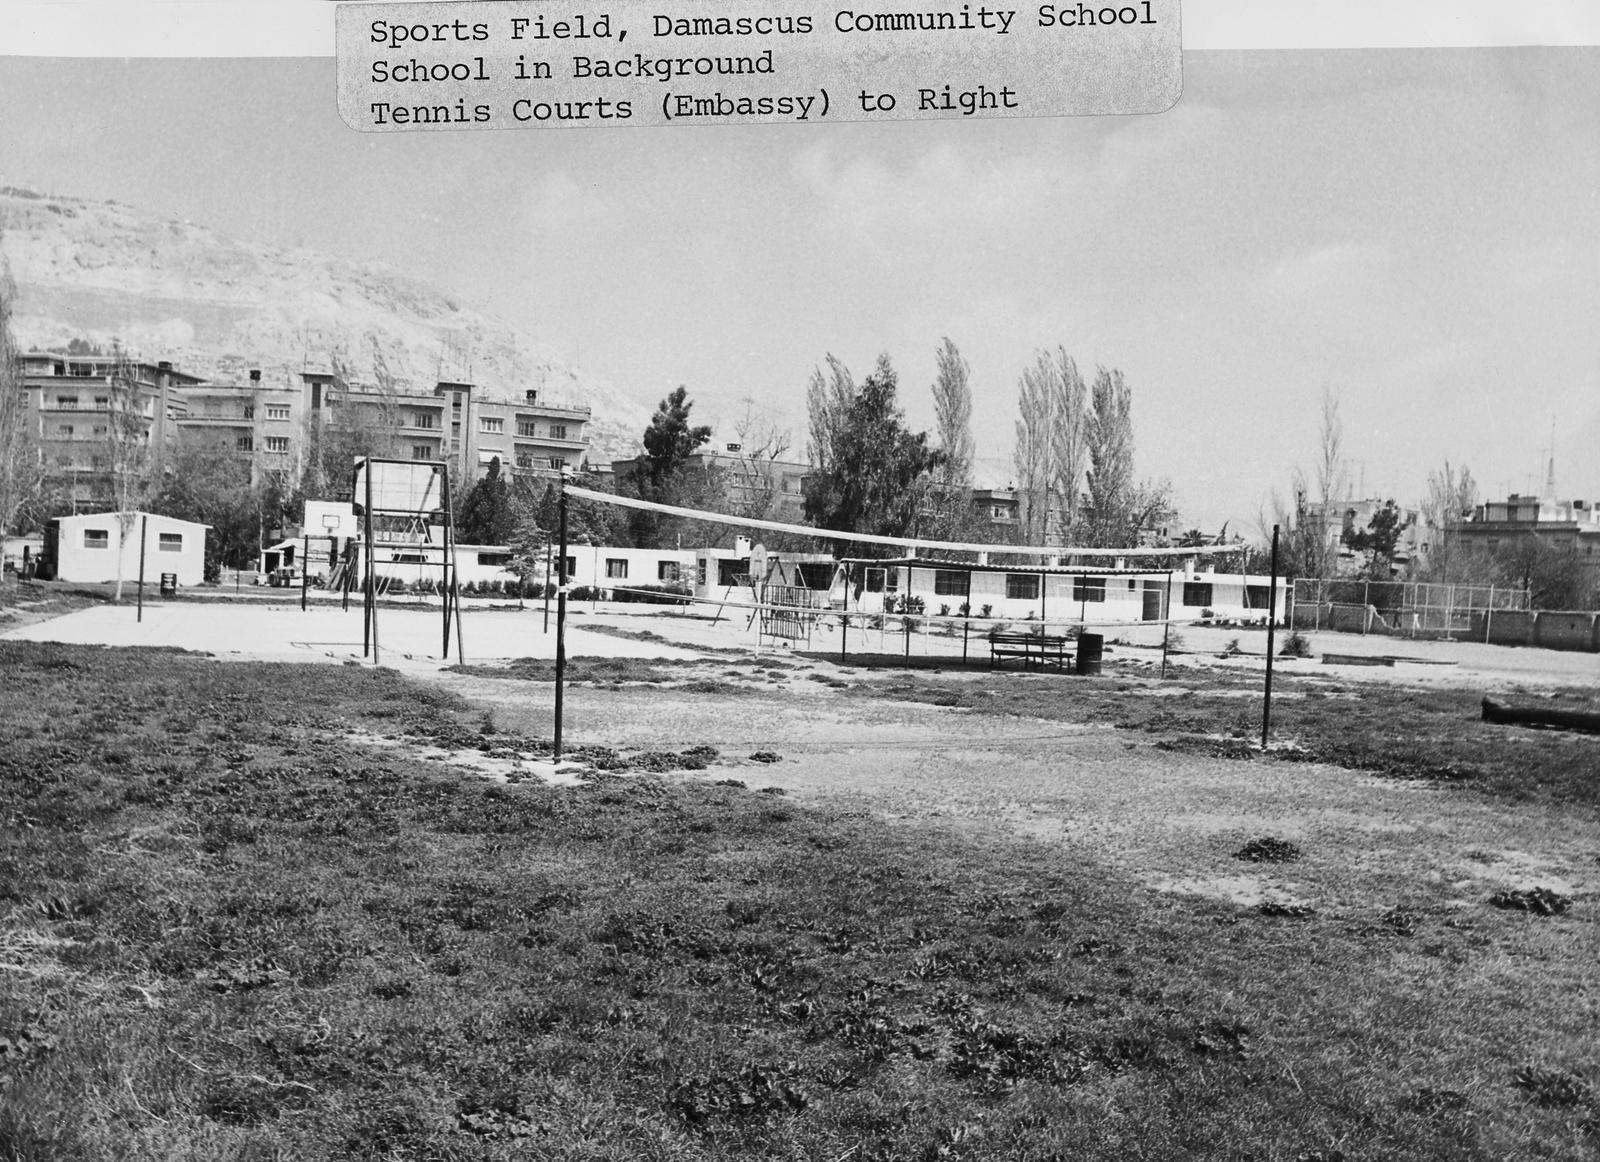 Damascus - Vacant Site - 1978